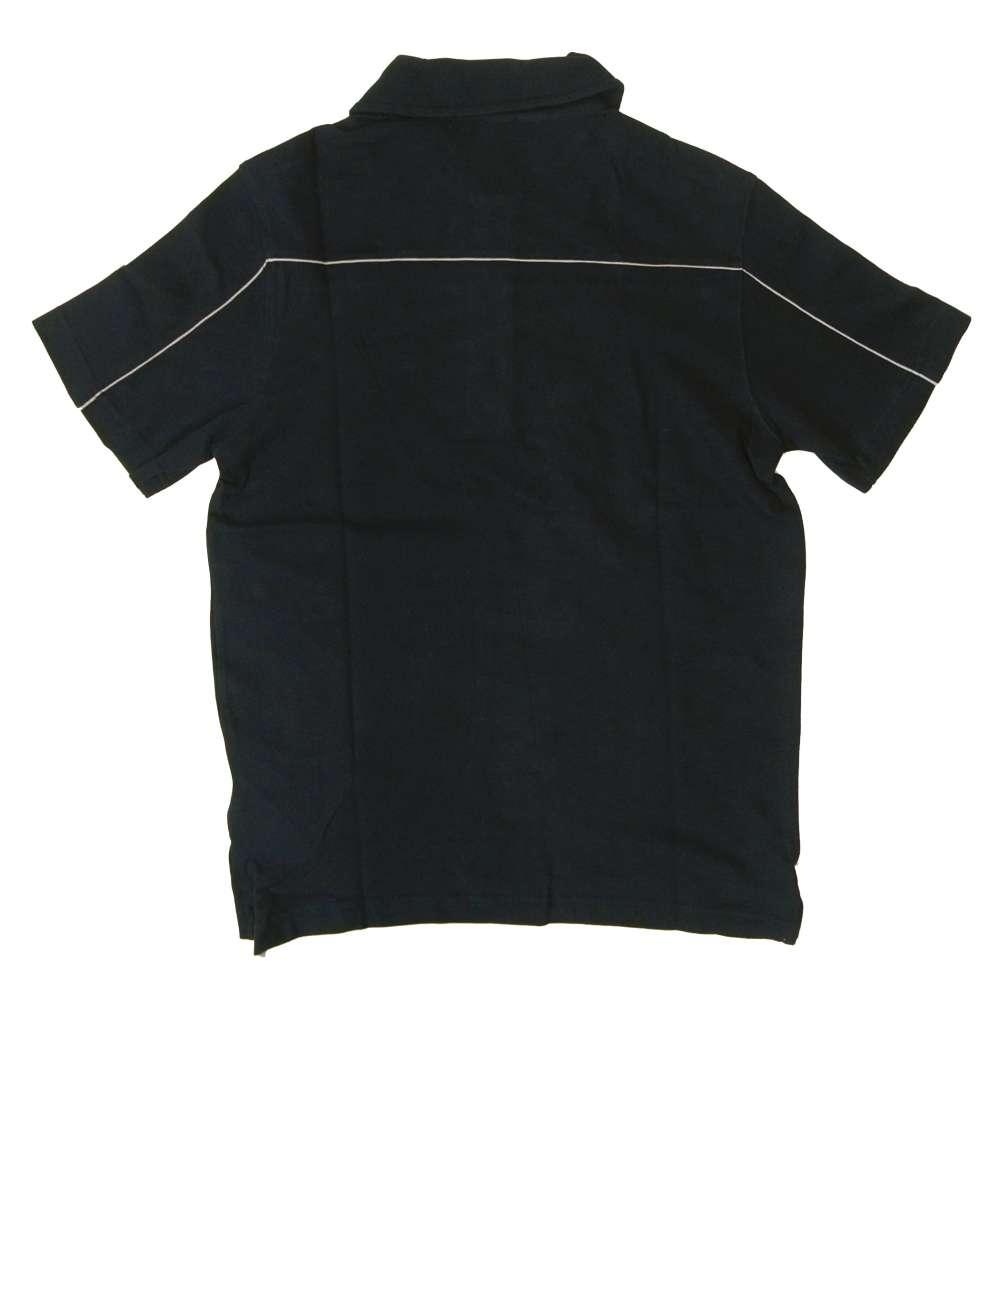 huge selection of 22569 dcfd9 ポロシャツ 濃紺 ゴルフ メンズ エンポリオアルマーニ EA7